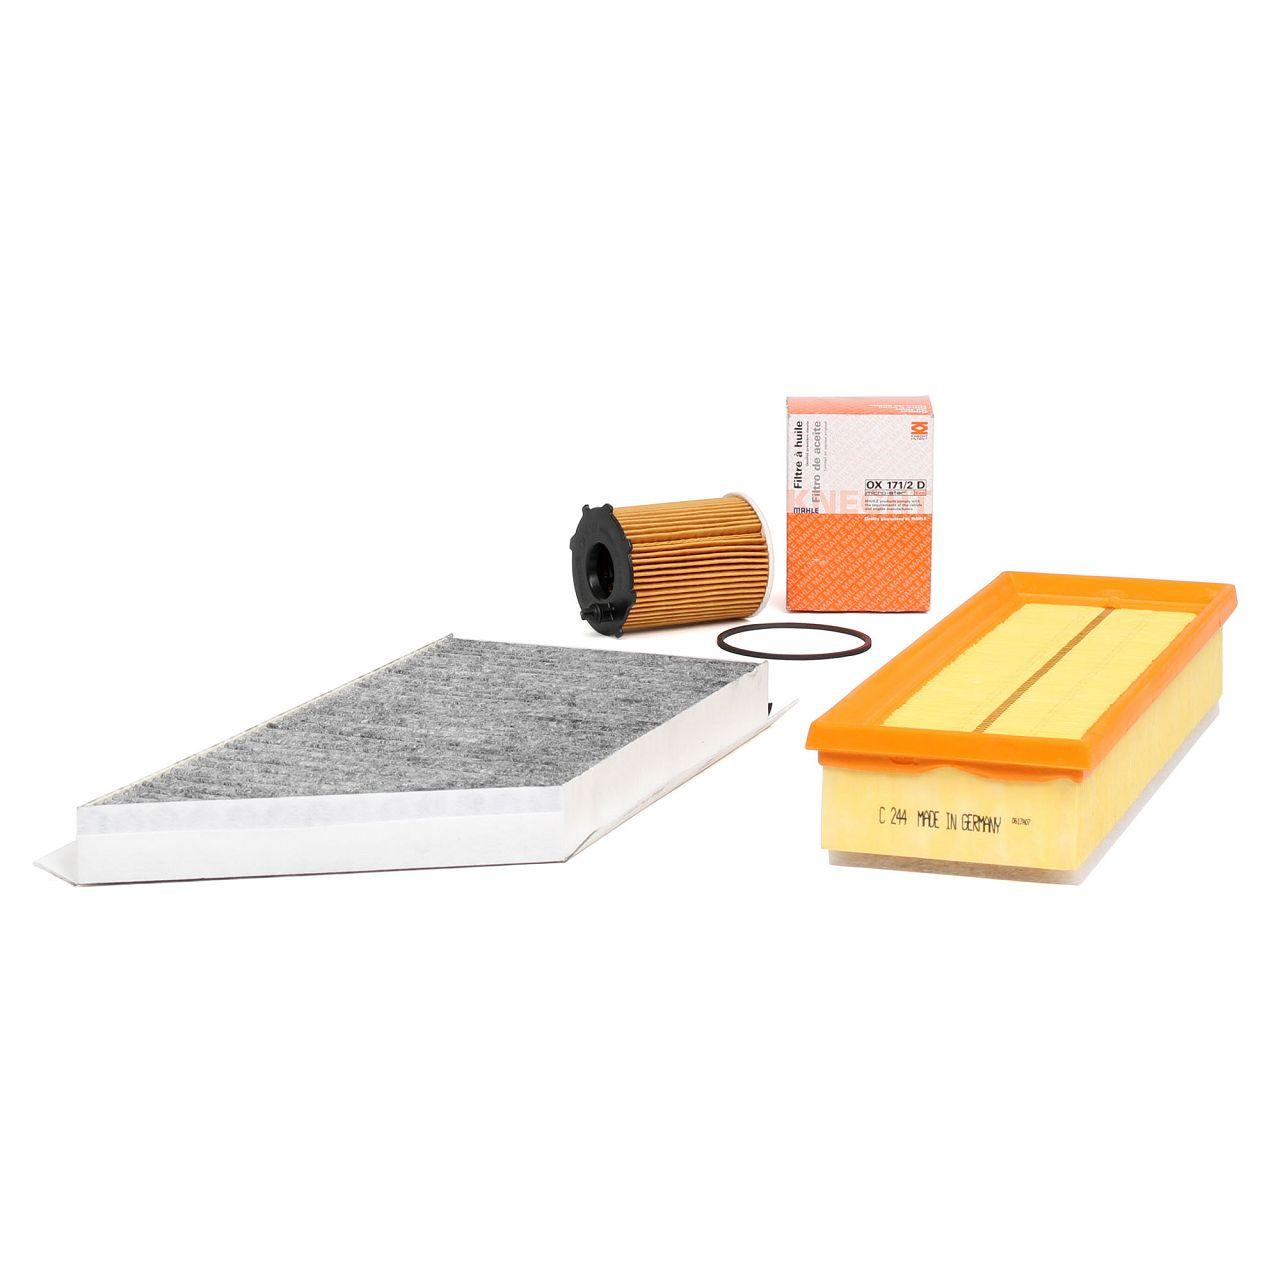 Inspektionskit Filterpaket Filterset für PEUGEOT 206 + SW + CC 1.6 HDI 110 109PS